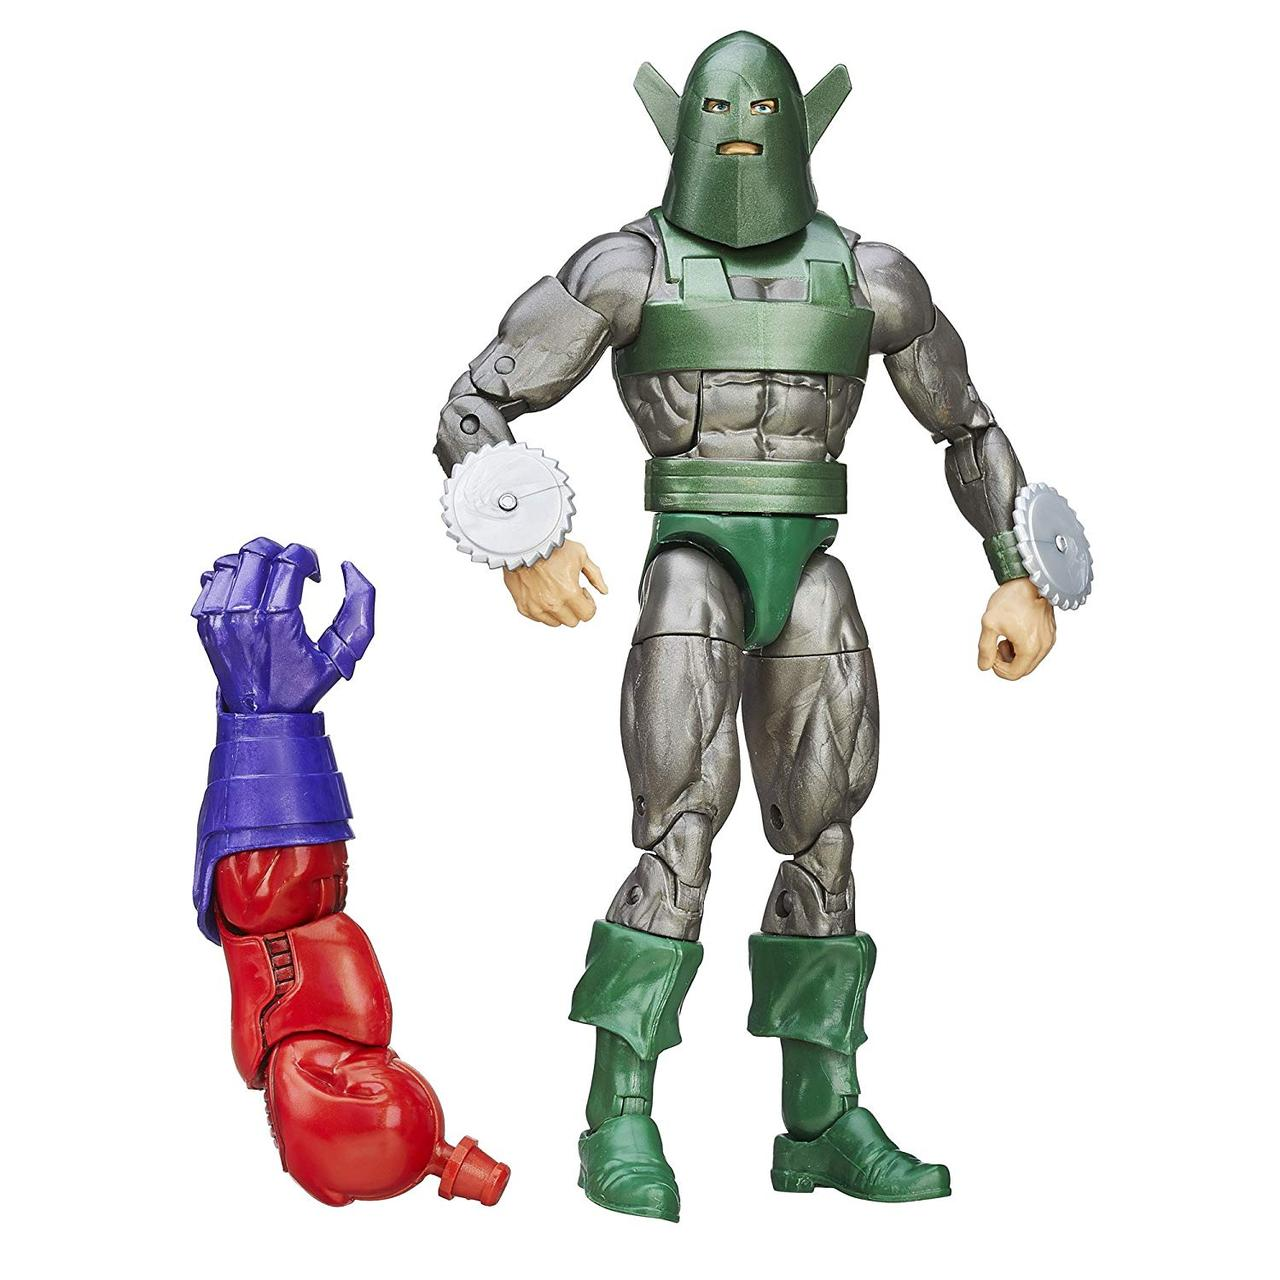 Фигурка Hasbro Вихрь, Легенды Марвел 15см - Build a Figure, Red Skull Series